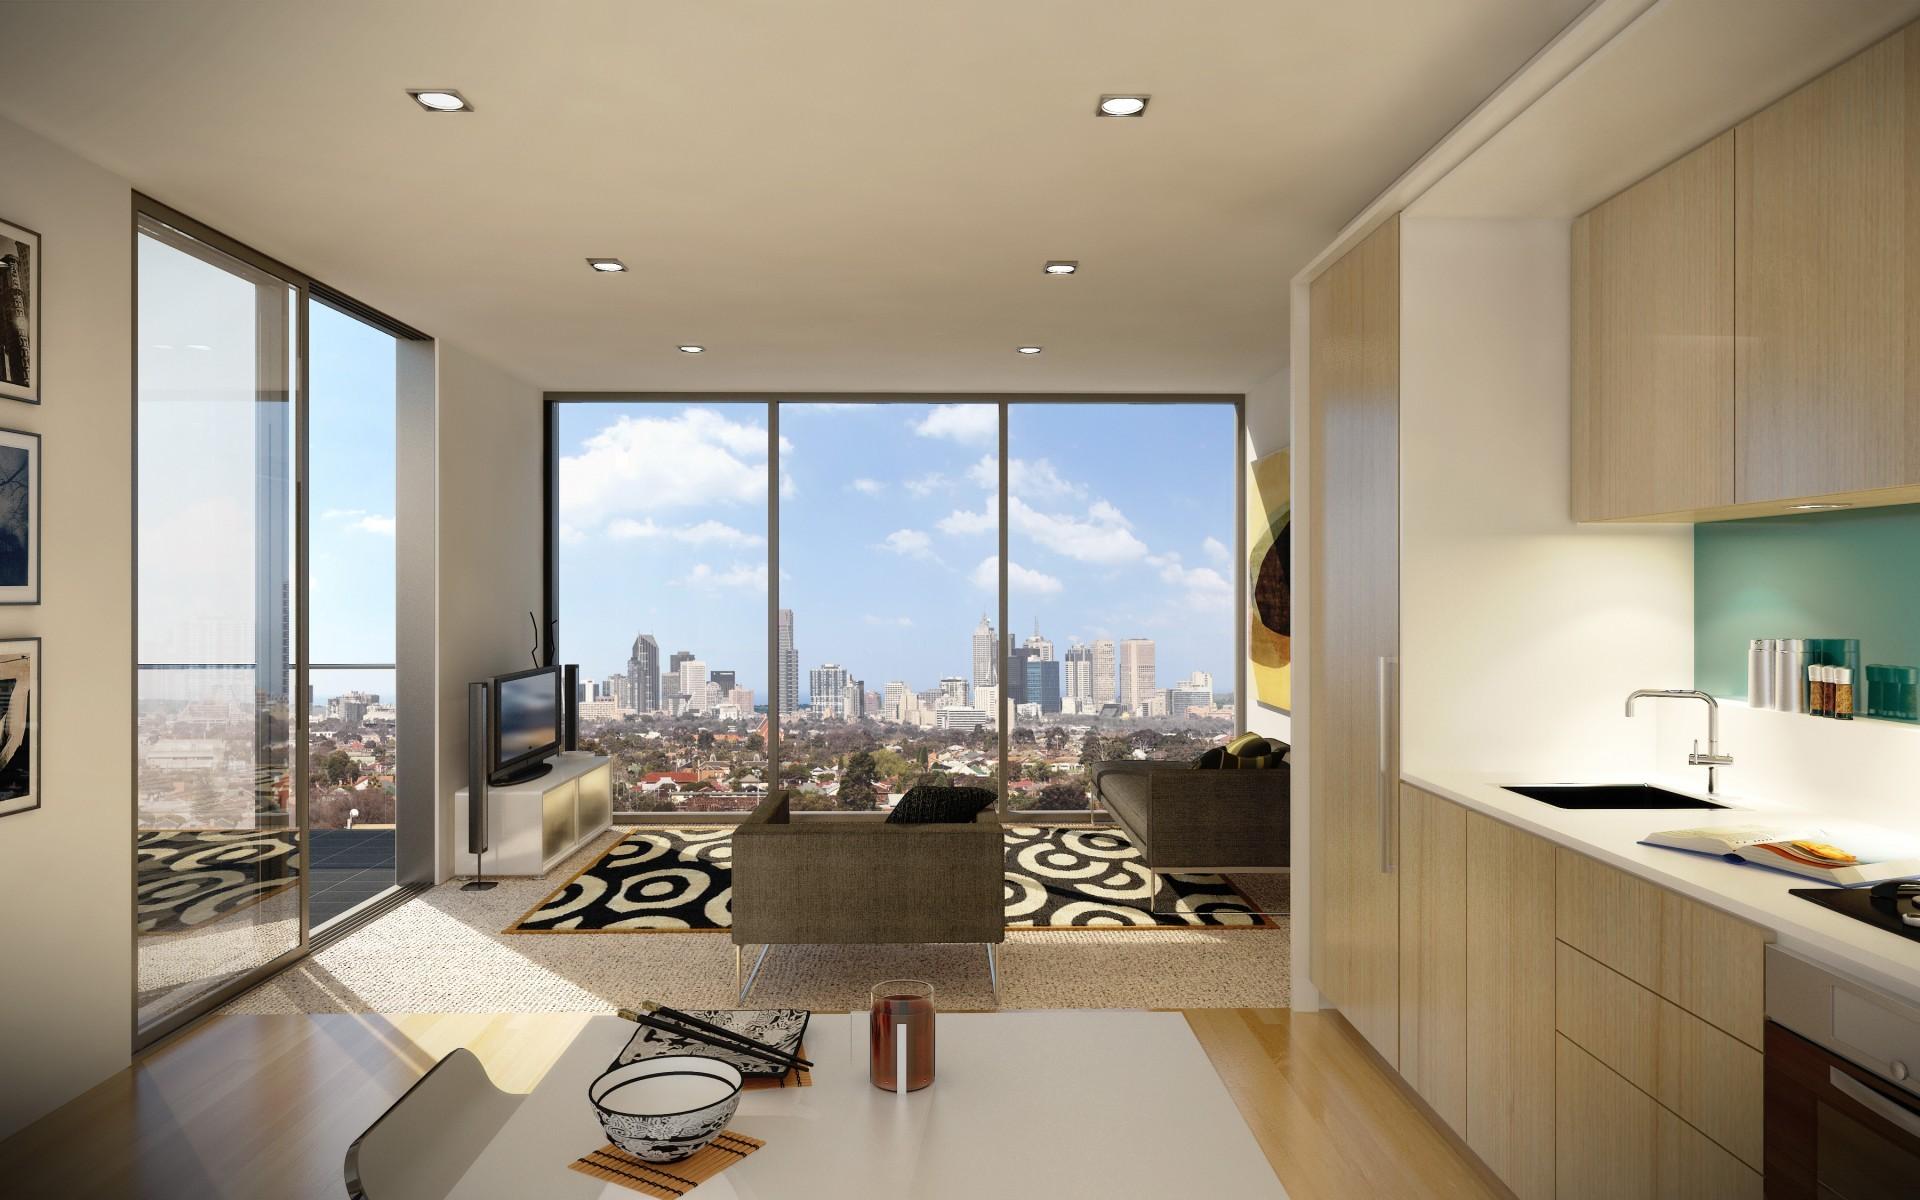 Fondos de pantalla habitaci n dise o de interiores - De salas inmobiliaria ...